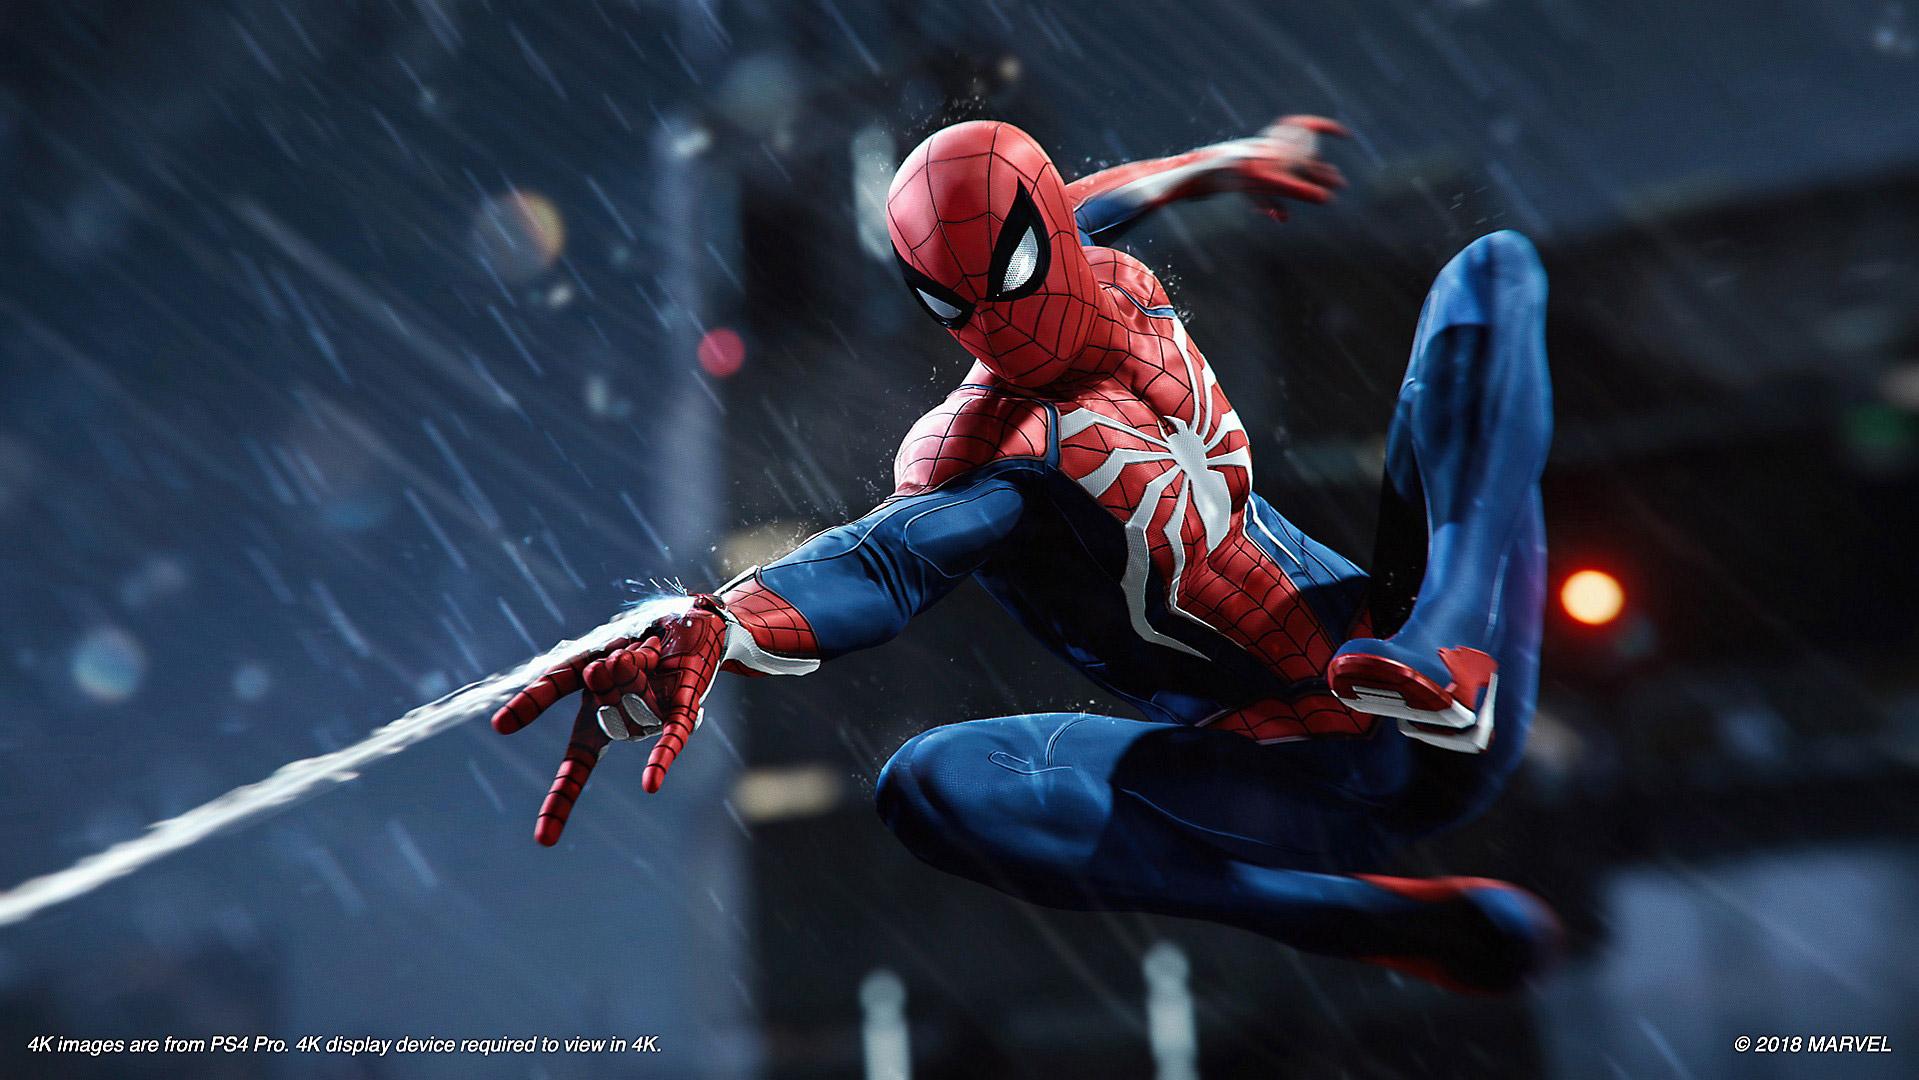 marvels spider-man ps4 pro